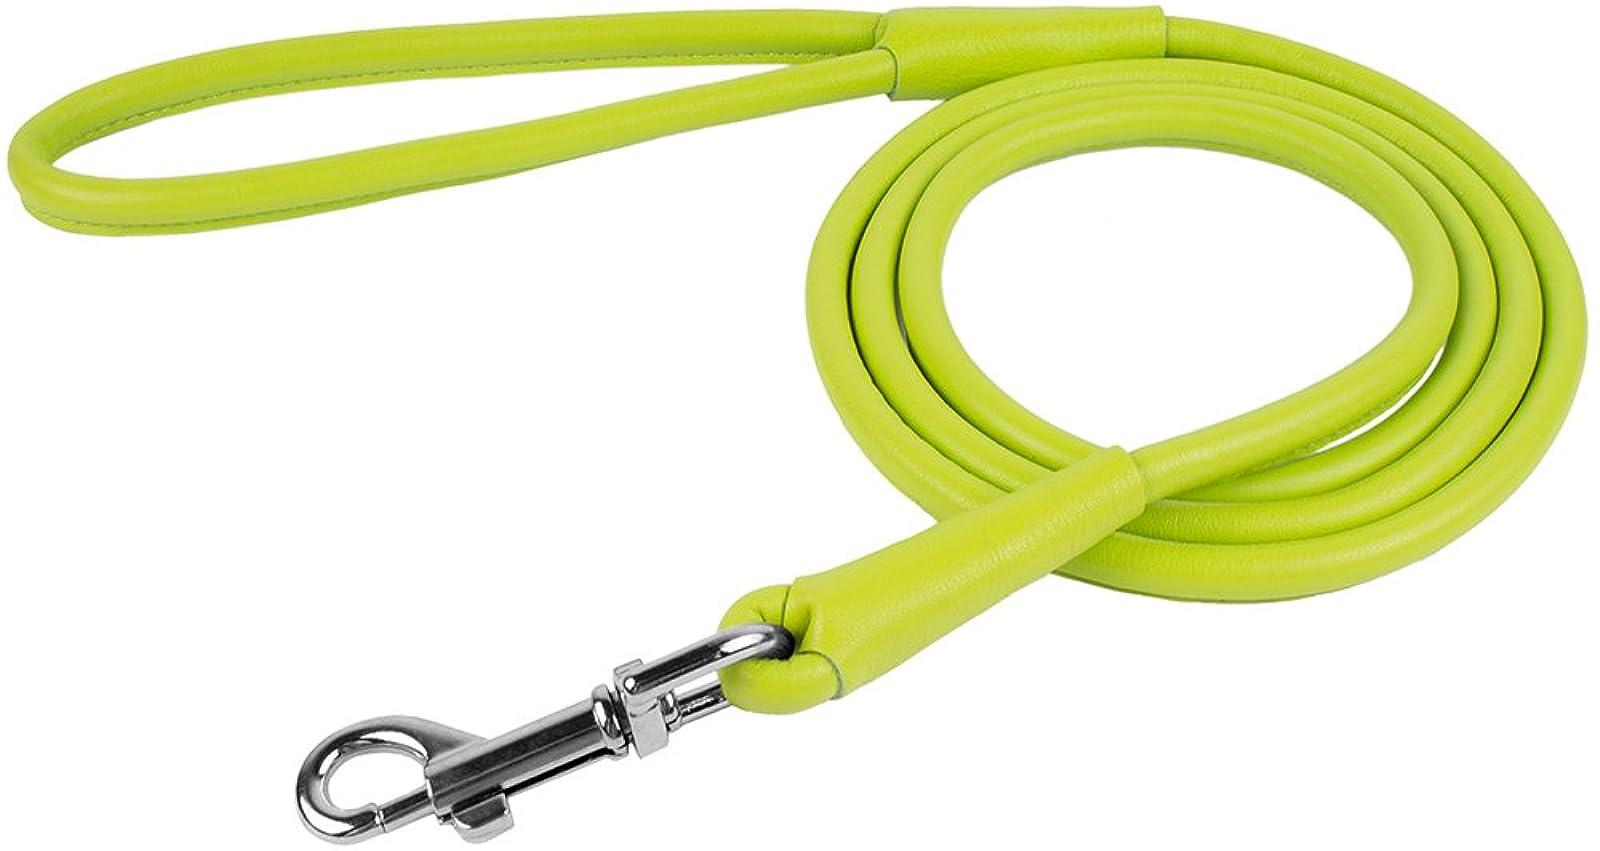 CollarDirect Rolled Leather Dog Leash 4ft Soft - 5